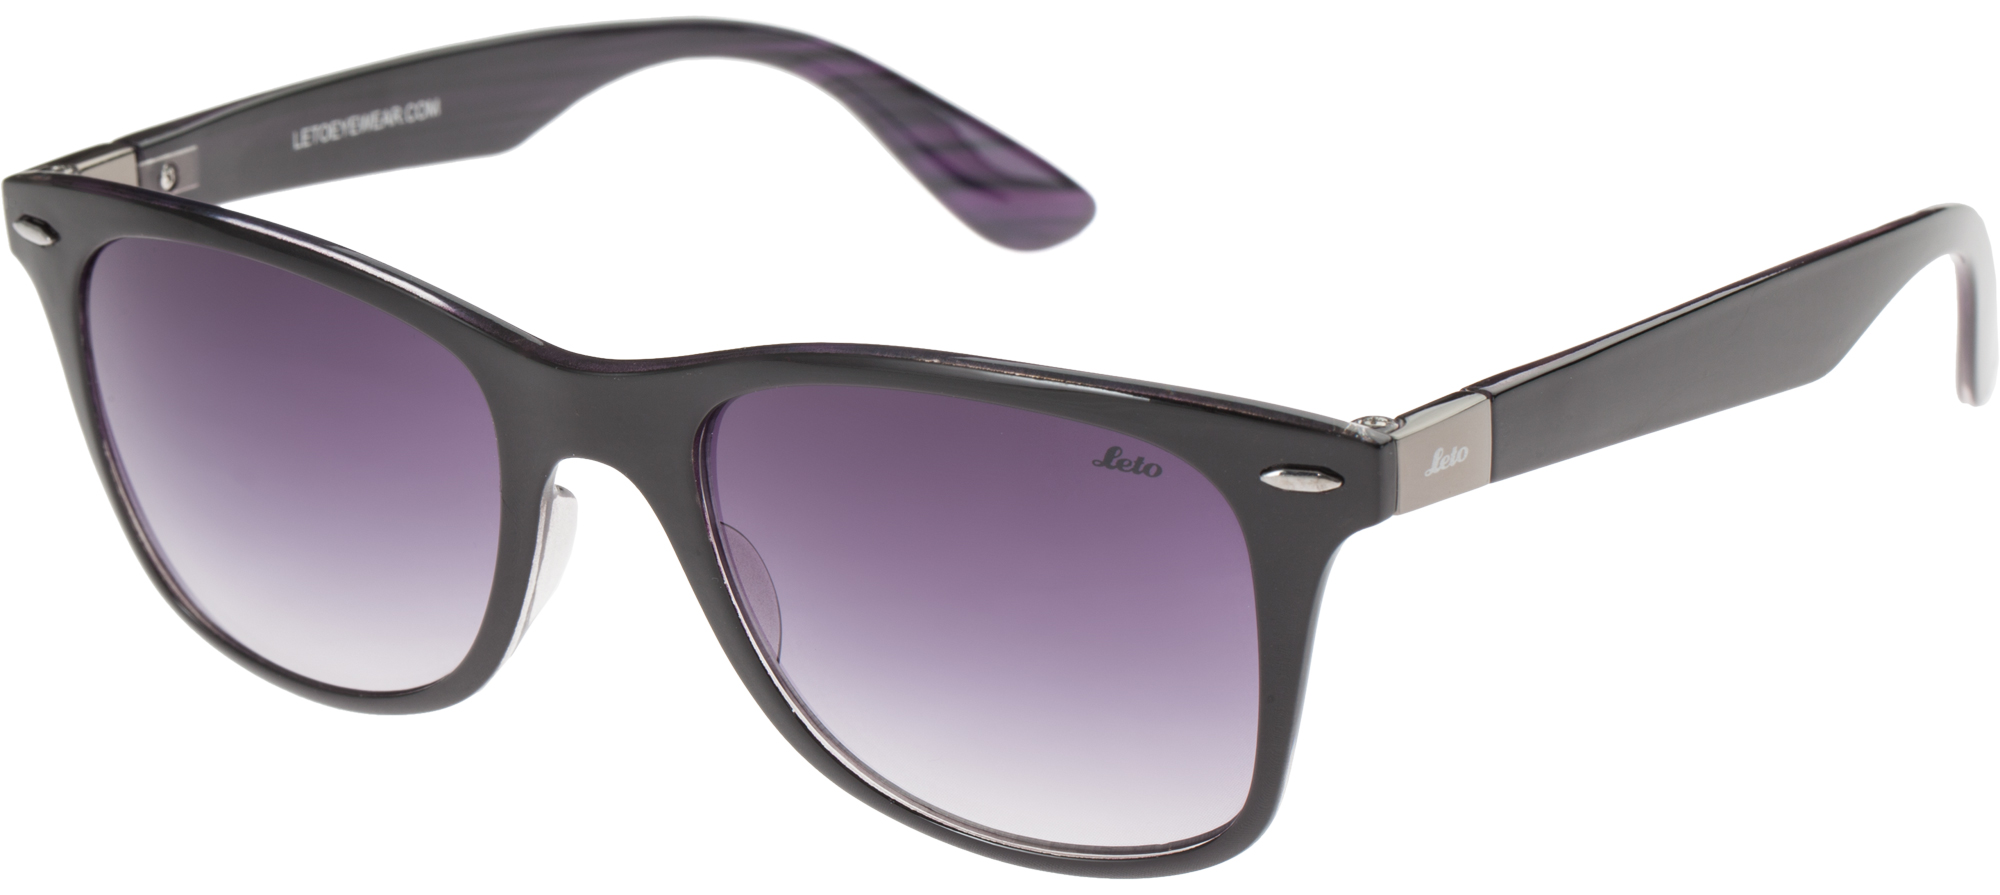 Leto Солнцезащитные очки Leto leto солнцезащитные очки мужские leto